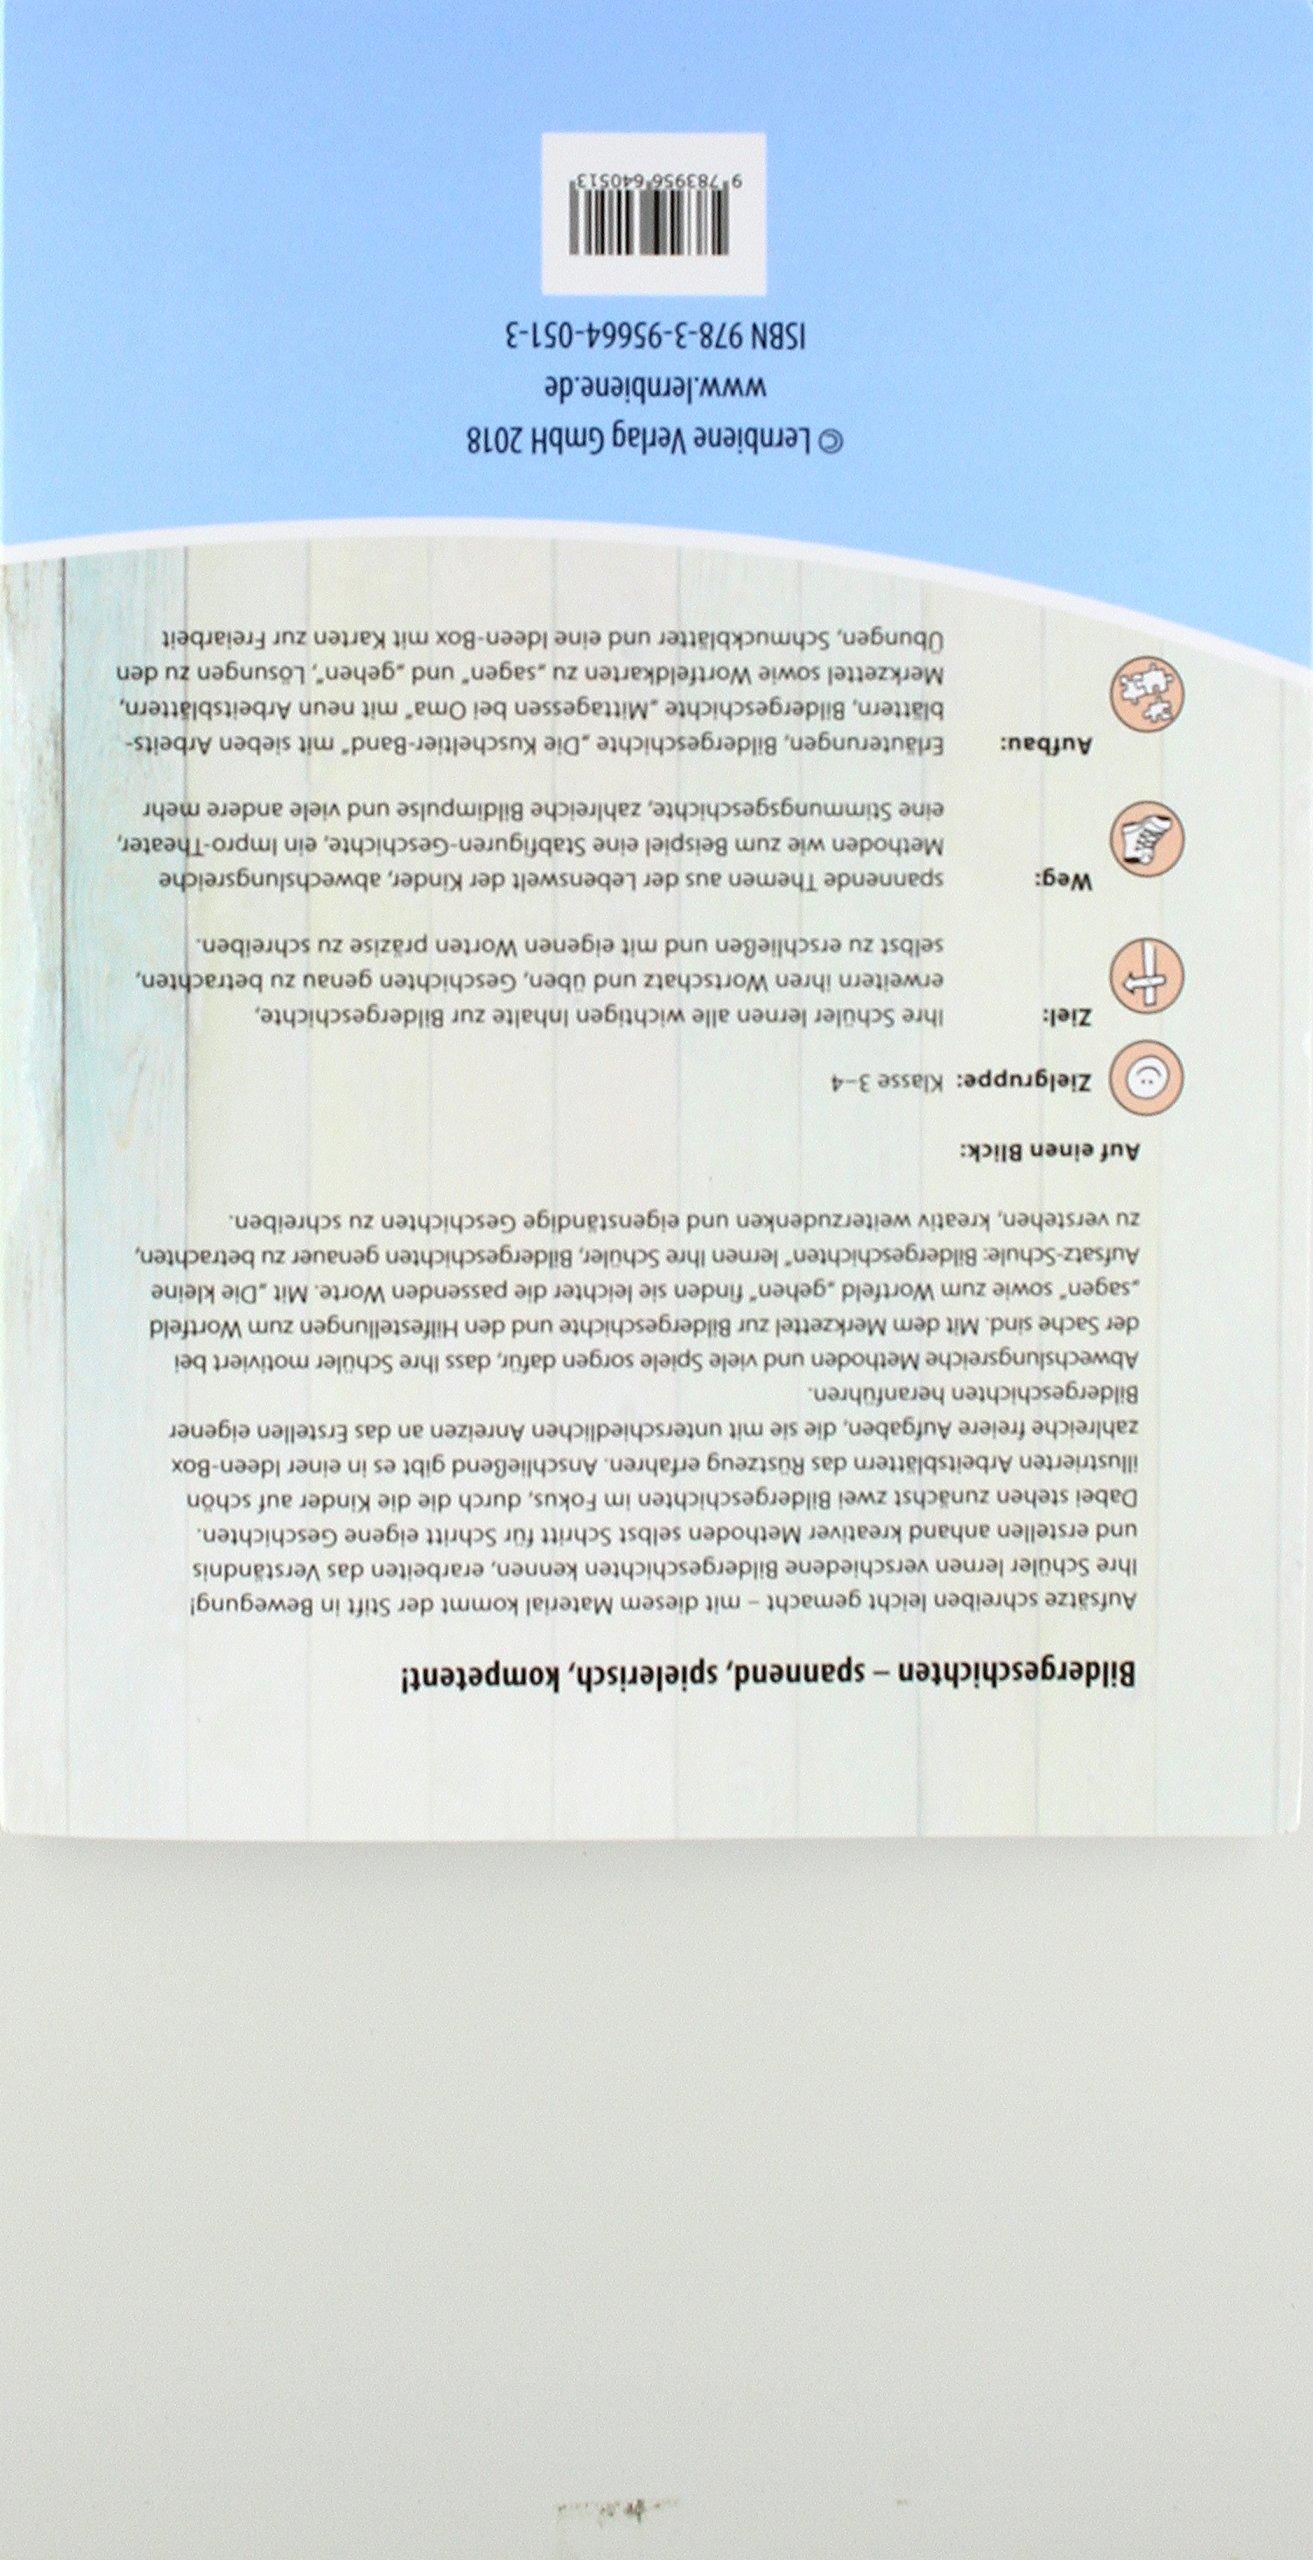 Outstanding Fl Worte Arbeitsblatt Motif - Mathe Arbeitsblatt ...